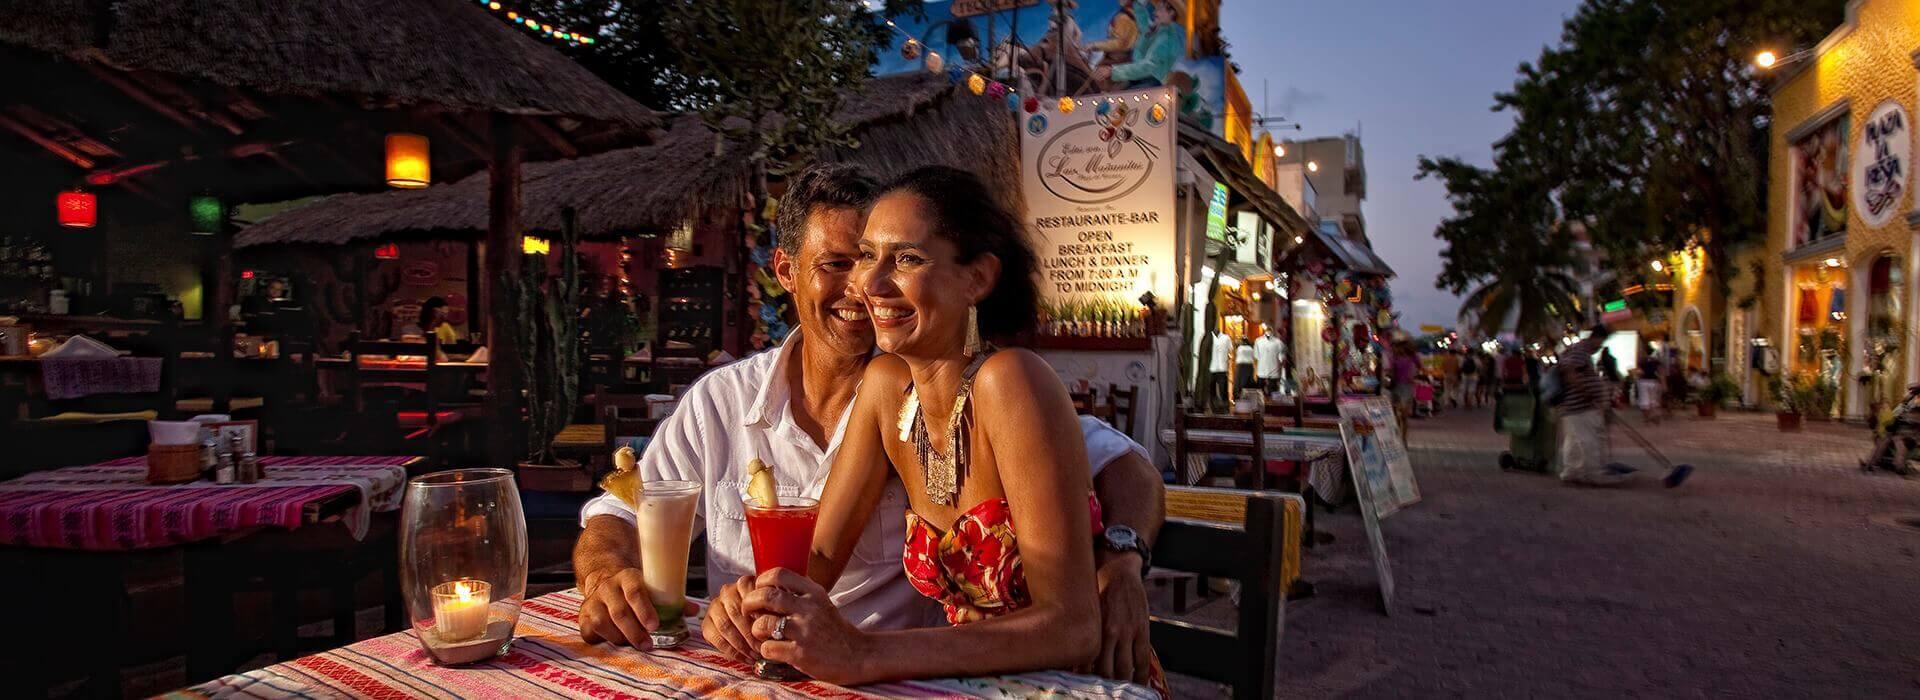 Playa del Carmen hotels near 5th Avenue